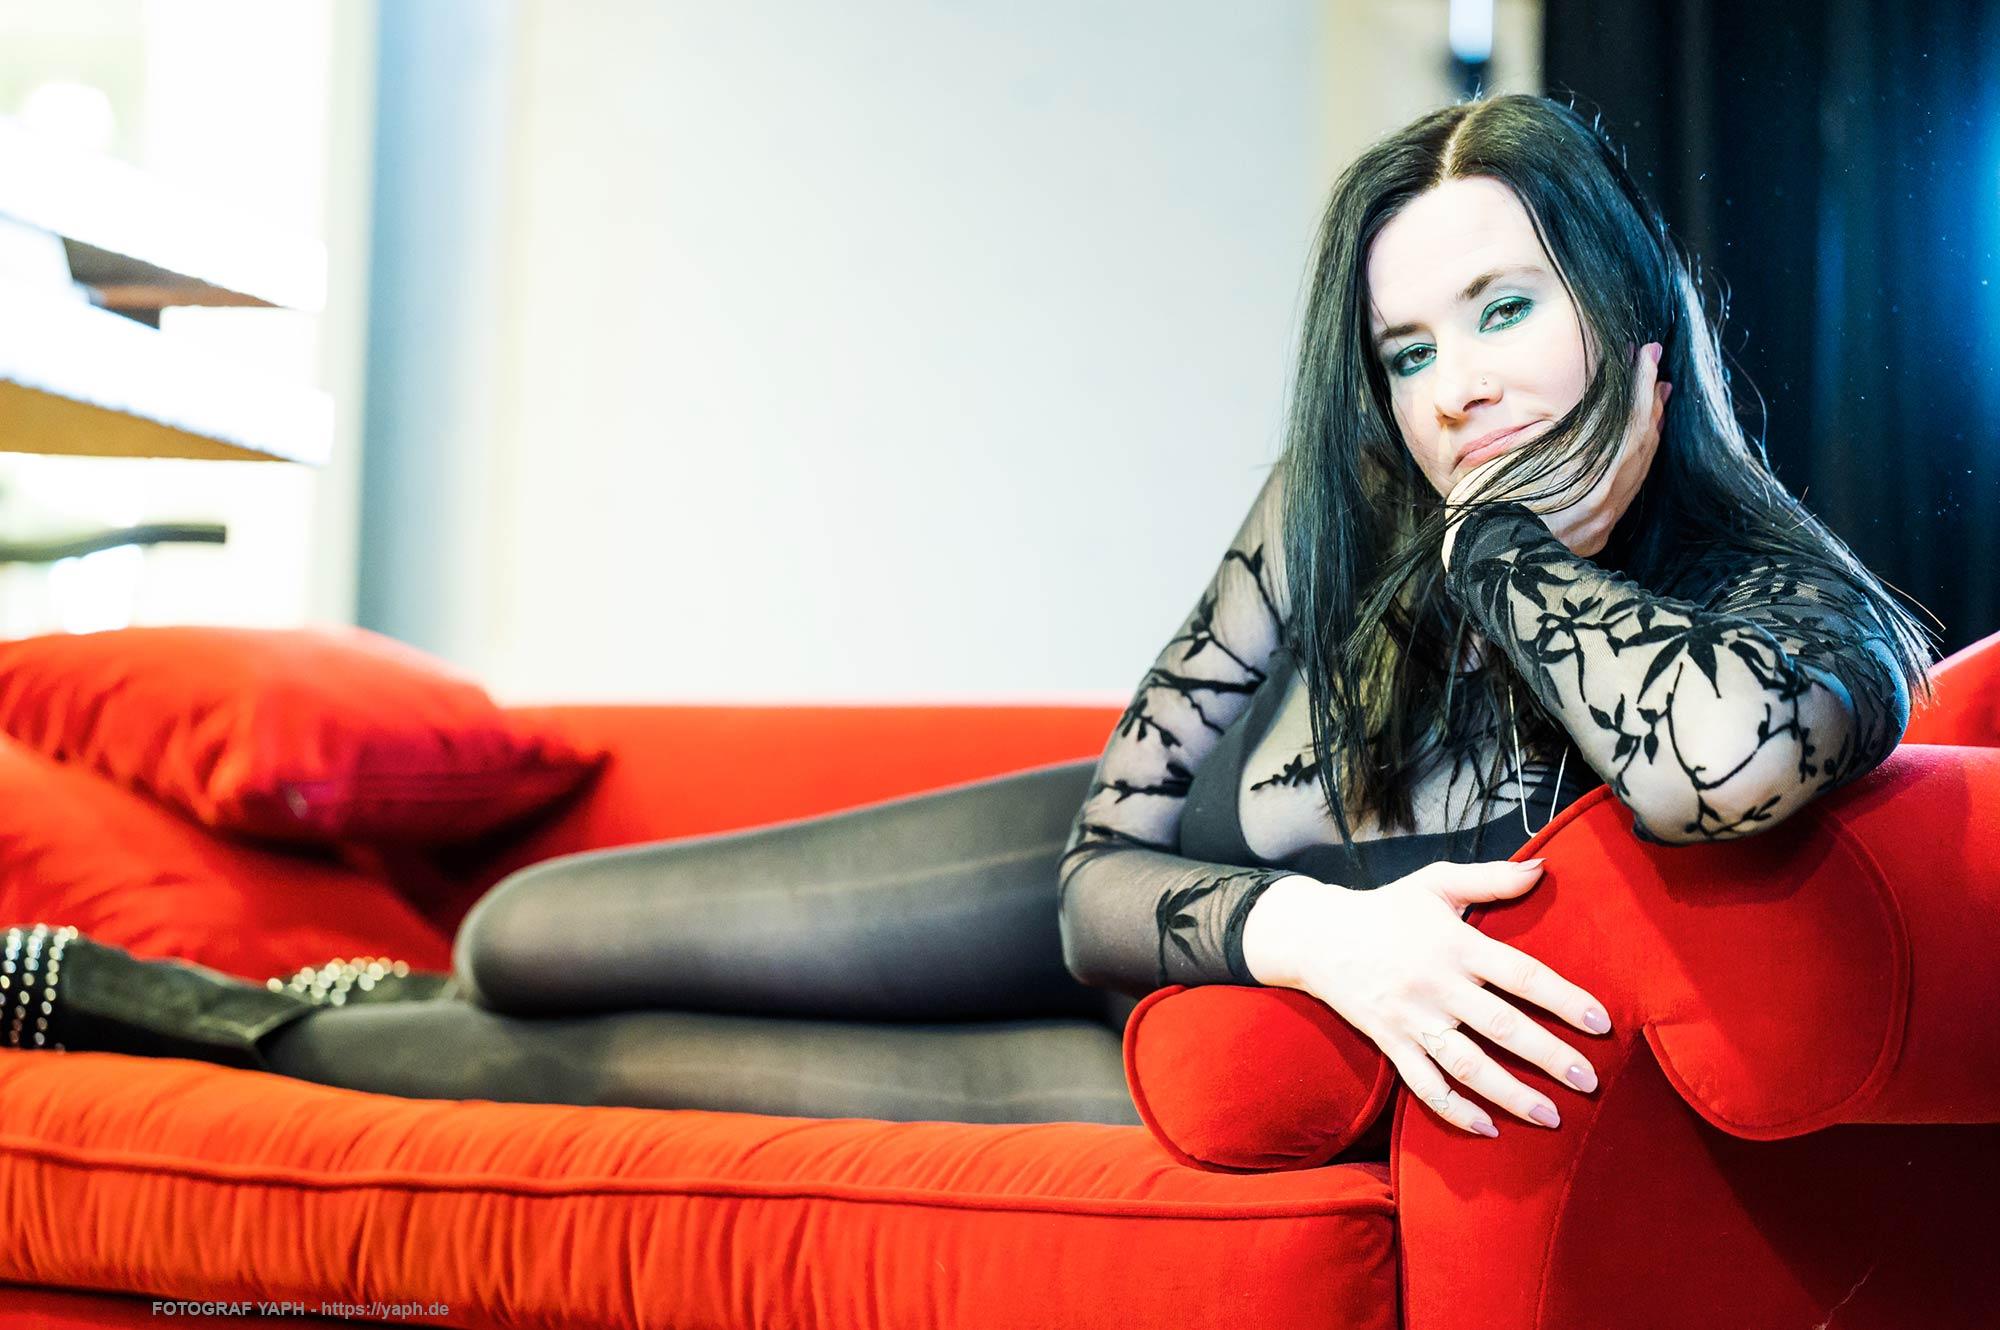 Brenda Zajac - Beauty Fotoshooting - Fotograf Trier - Yaph